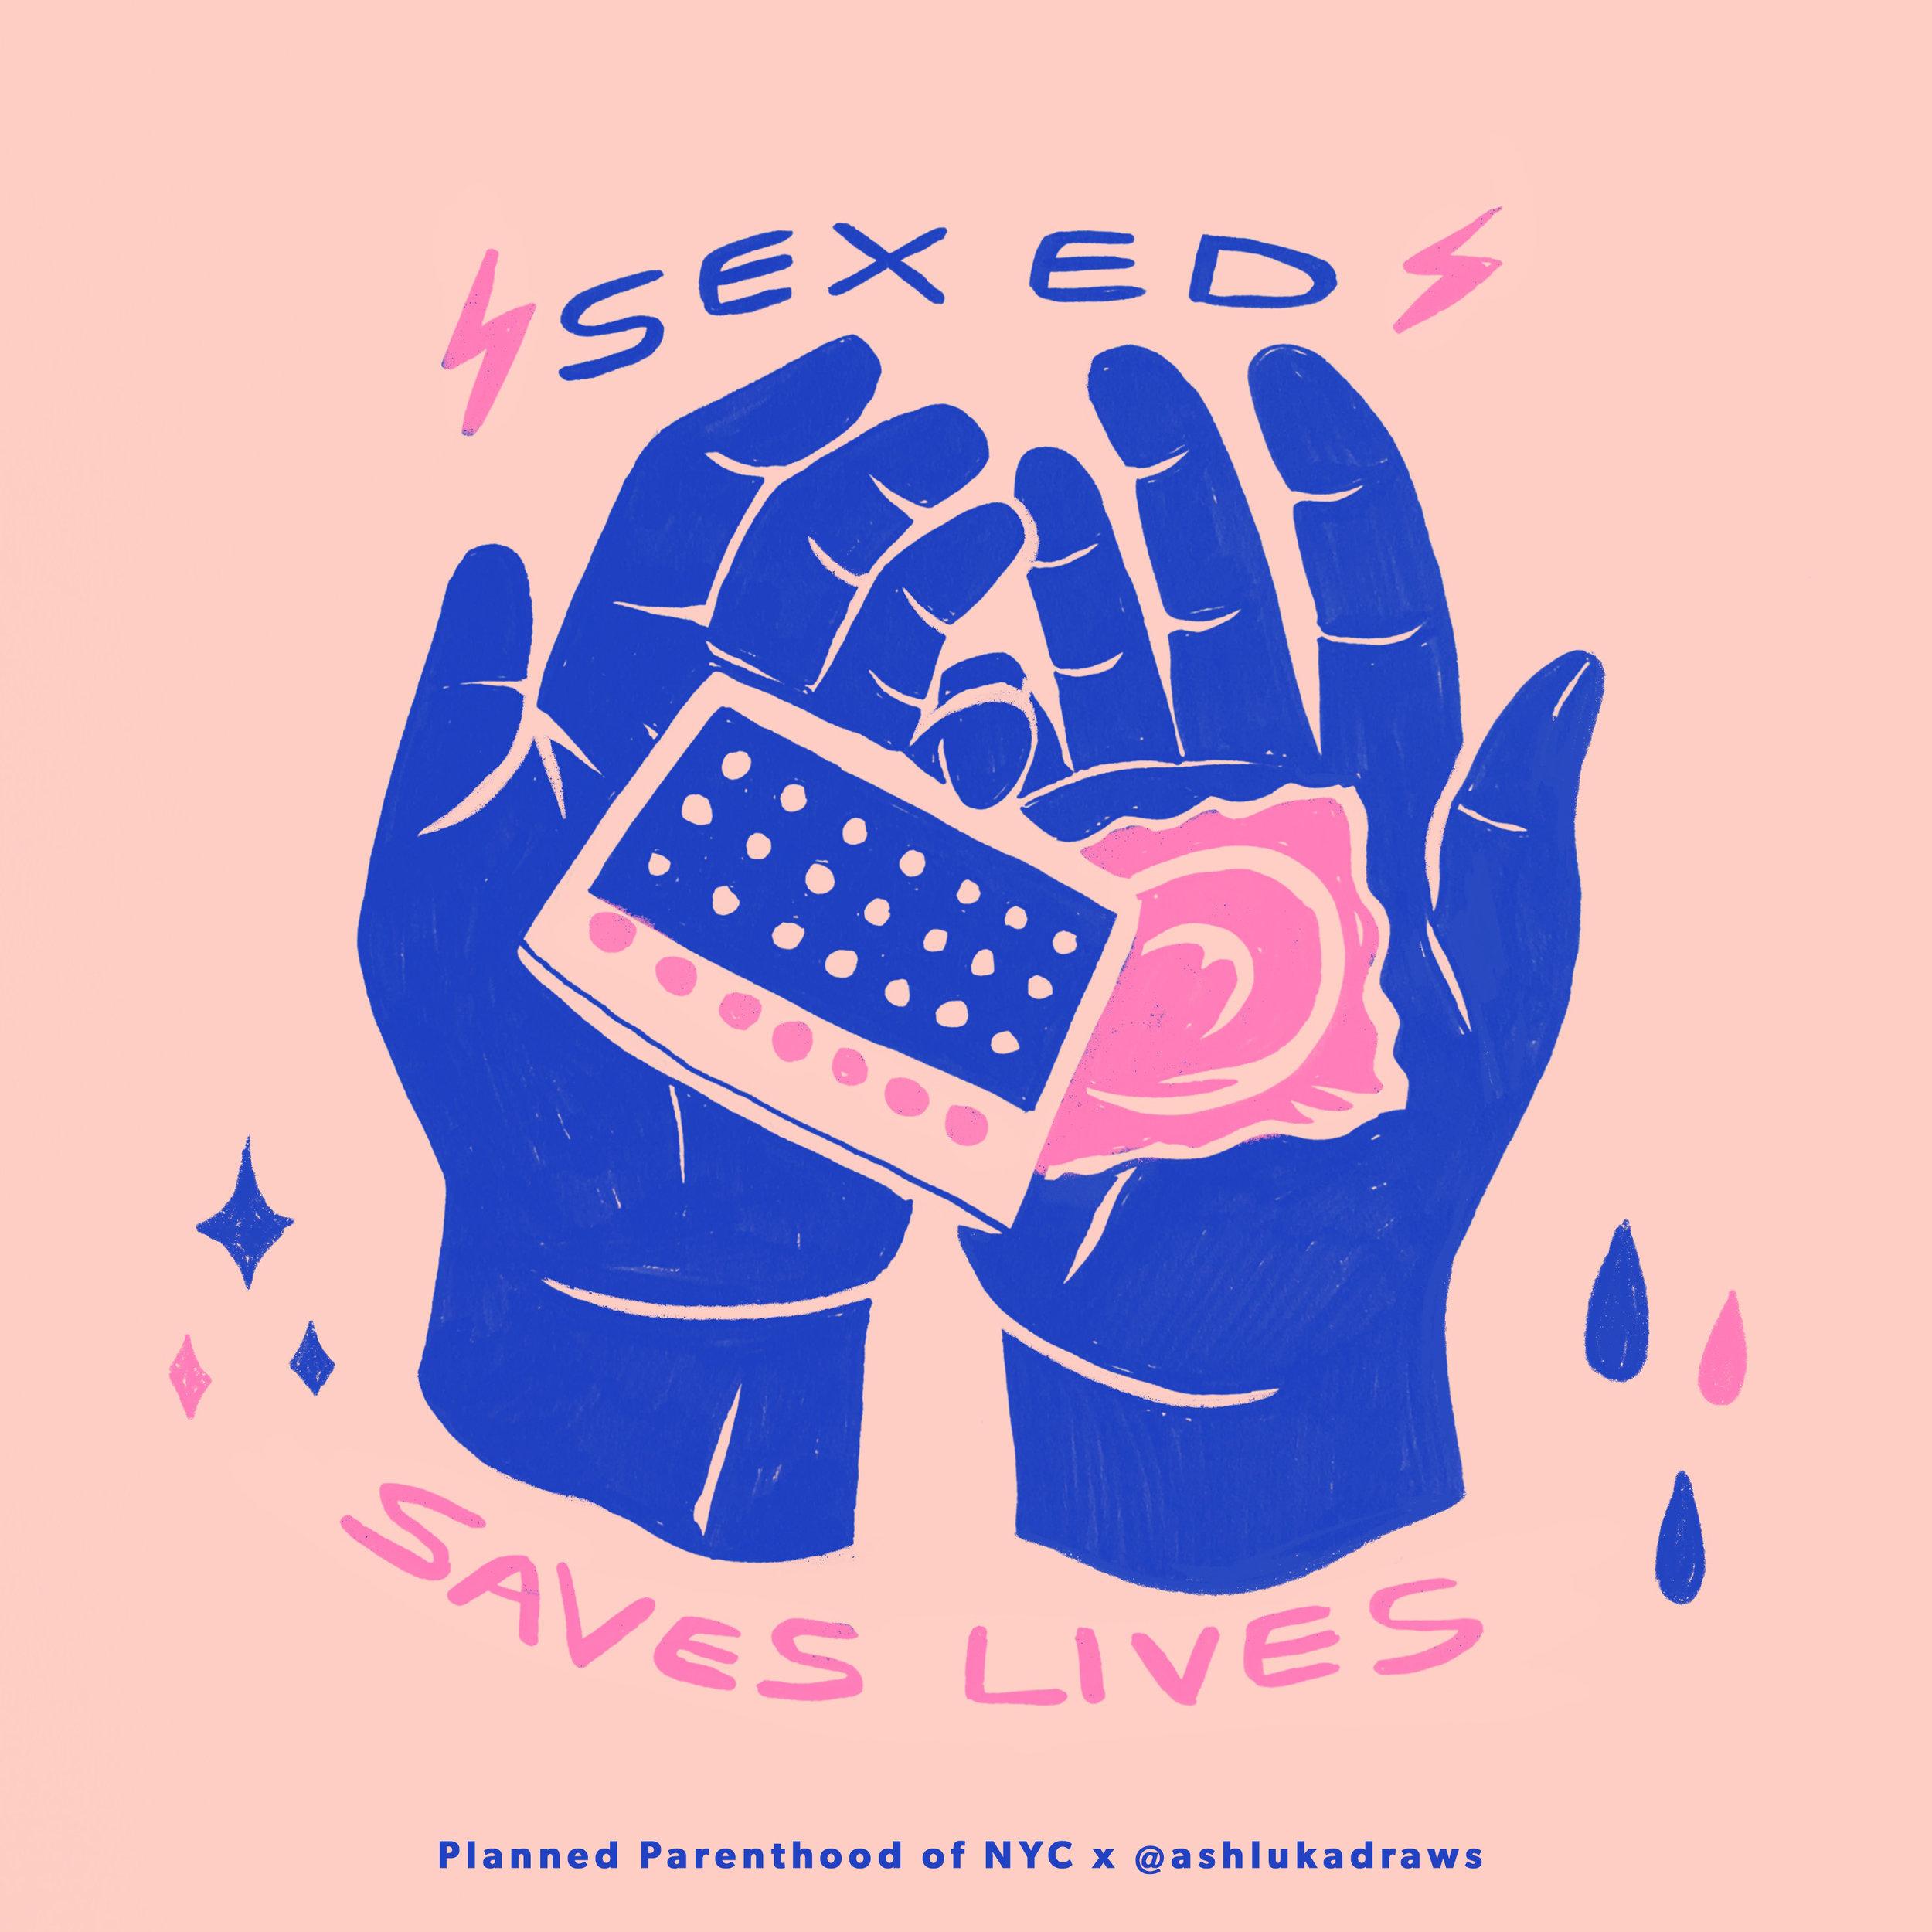 sexed_updated.jpg